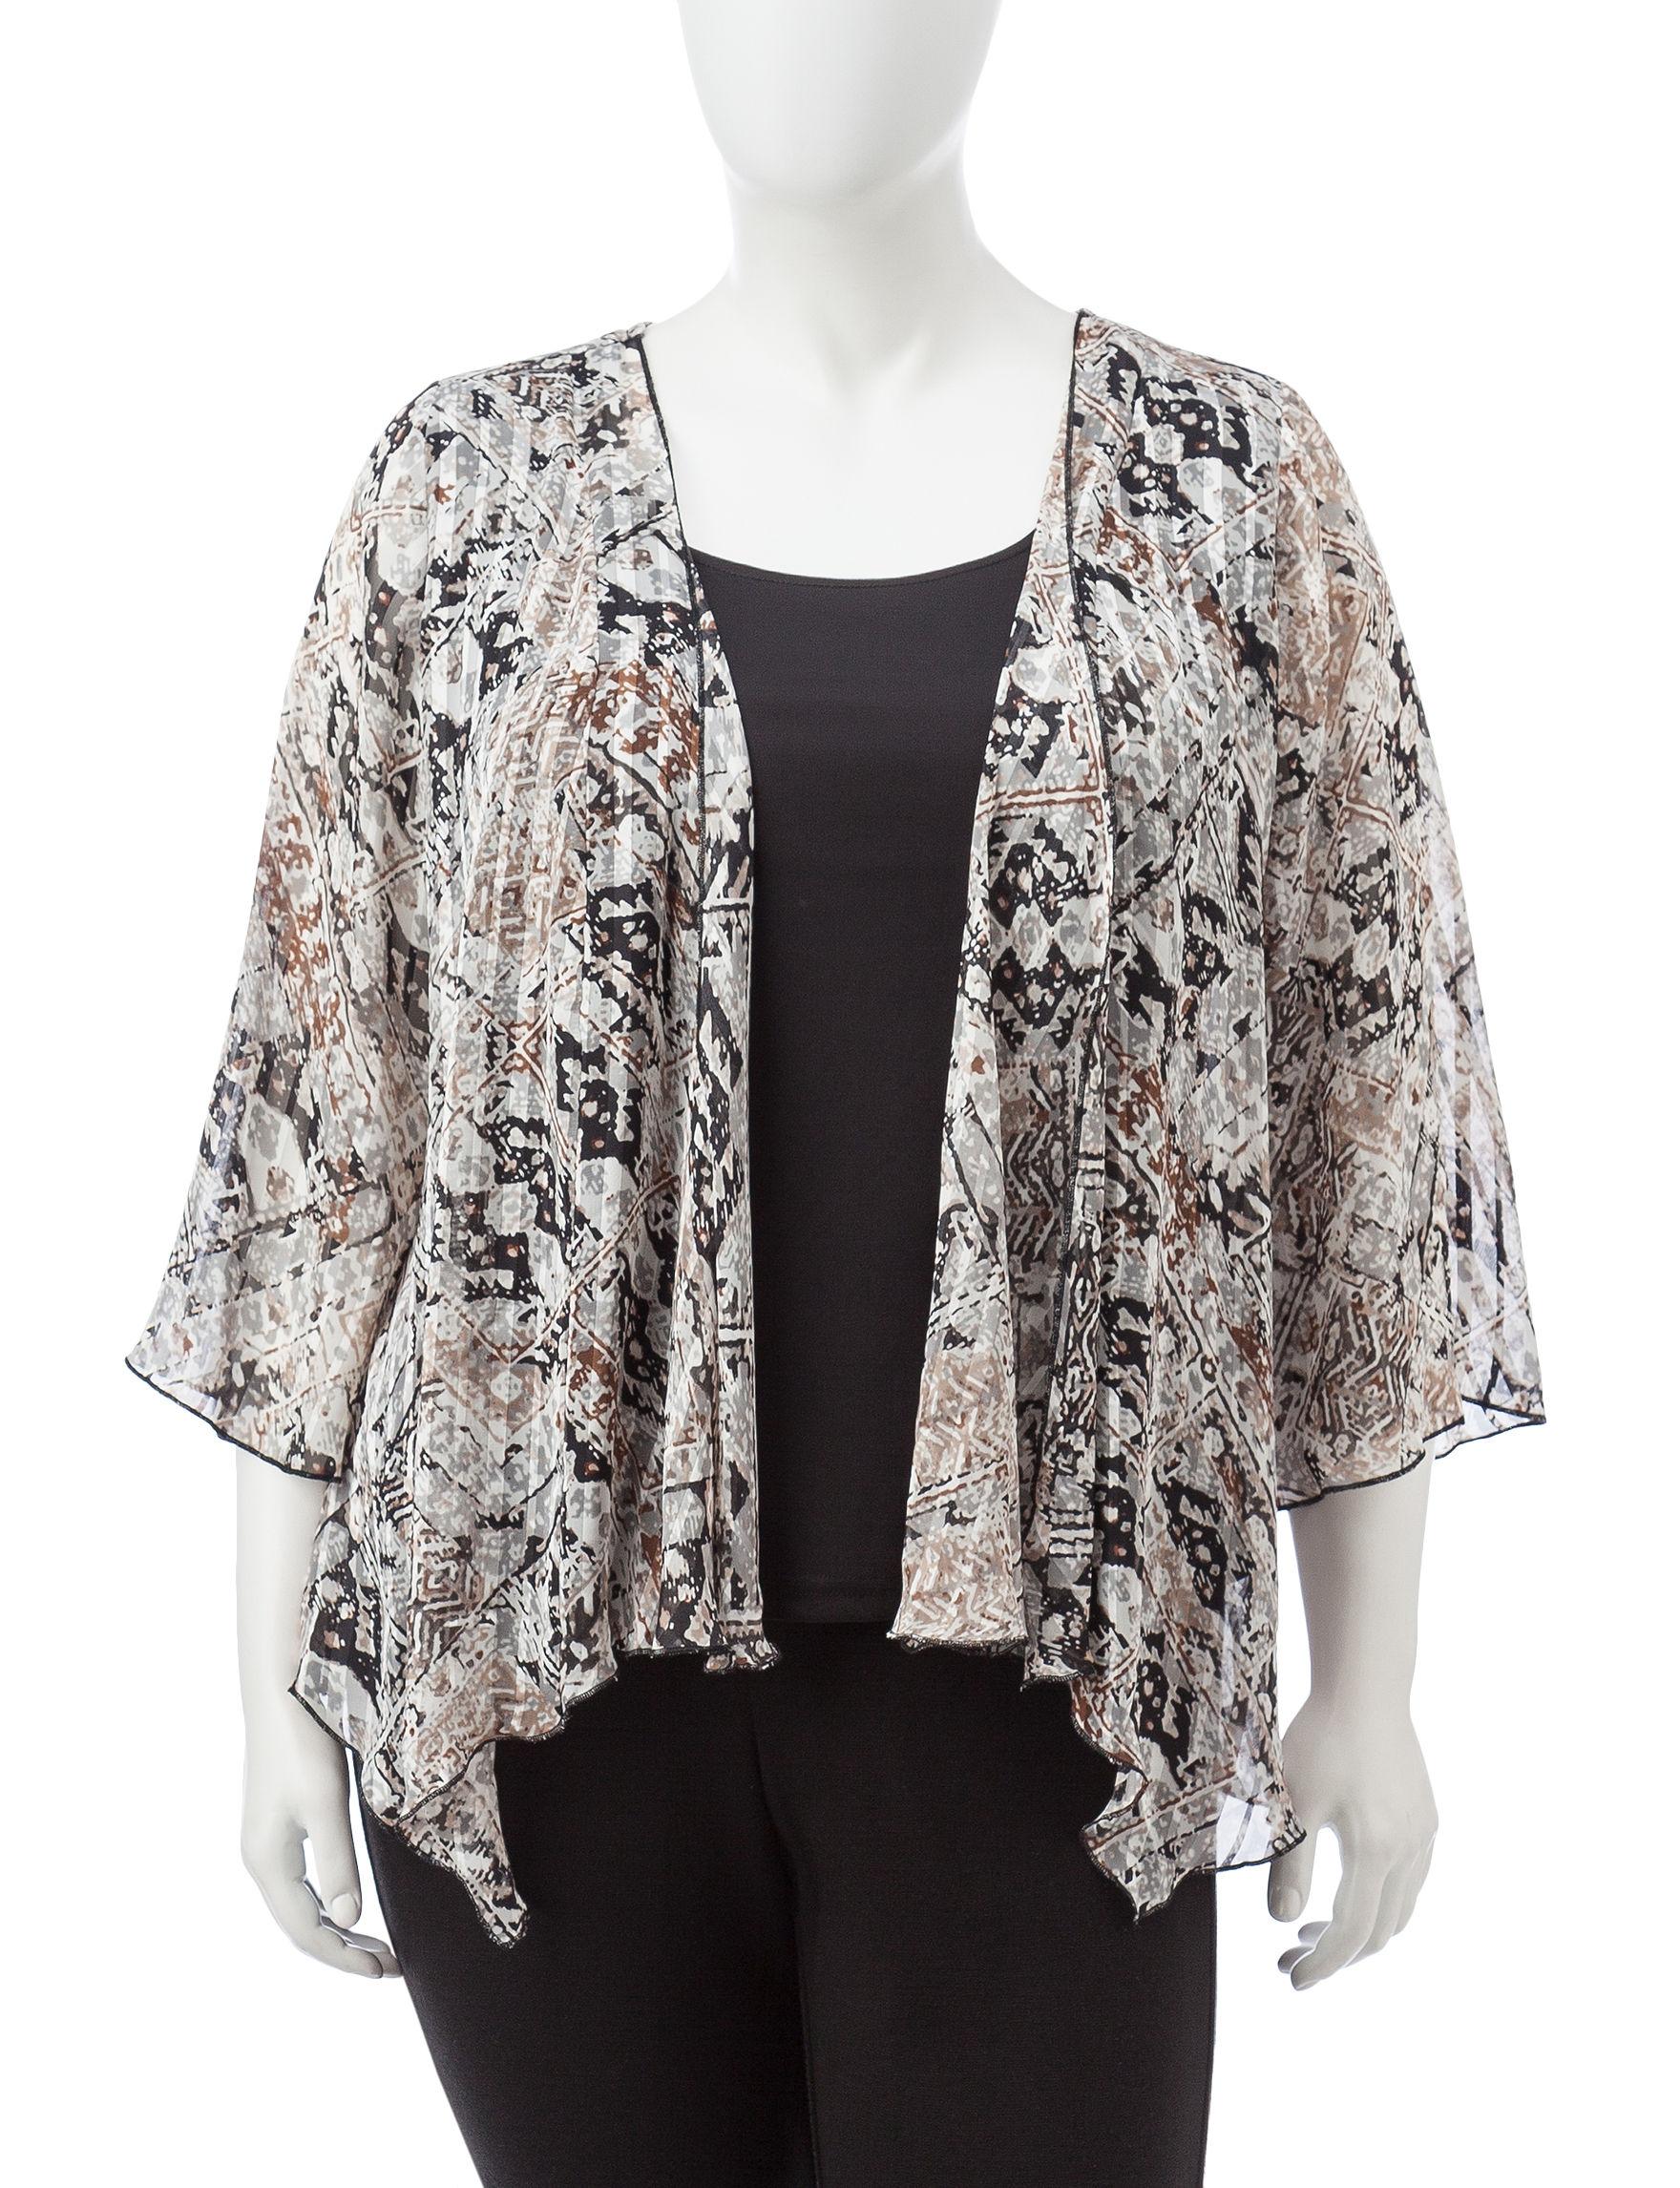 Sara Michelle Brown Shirts & Blouses